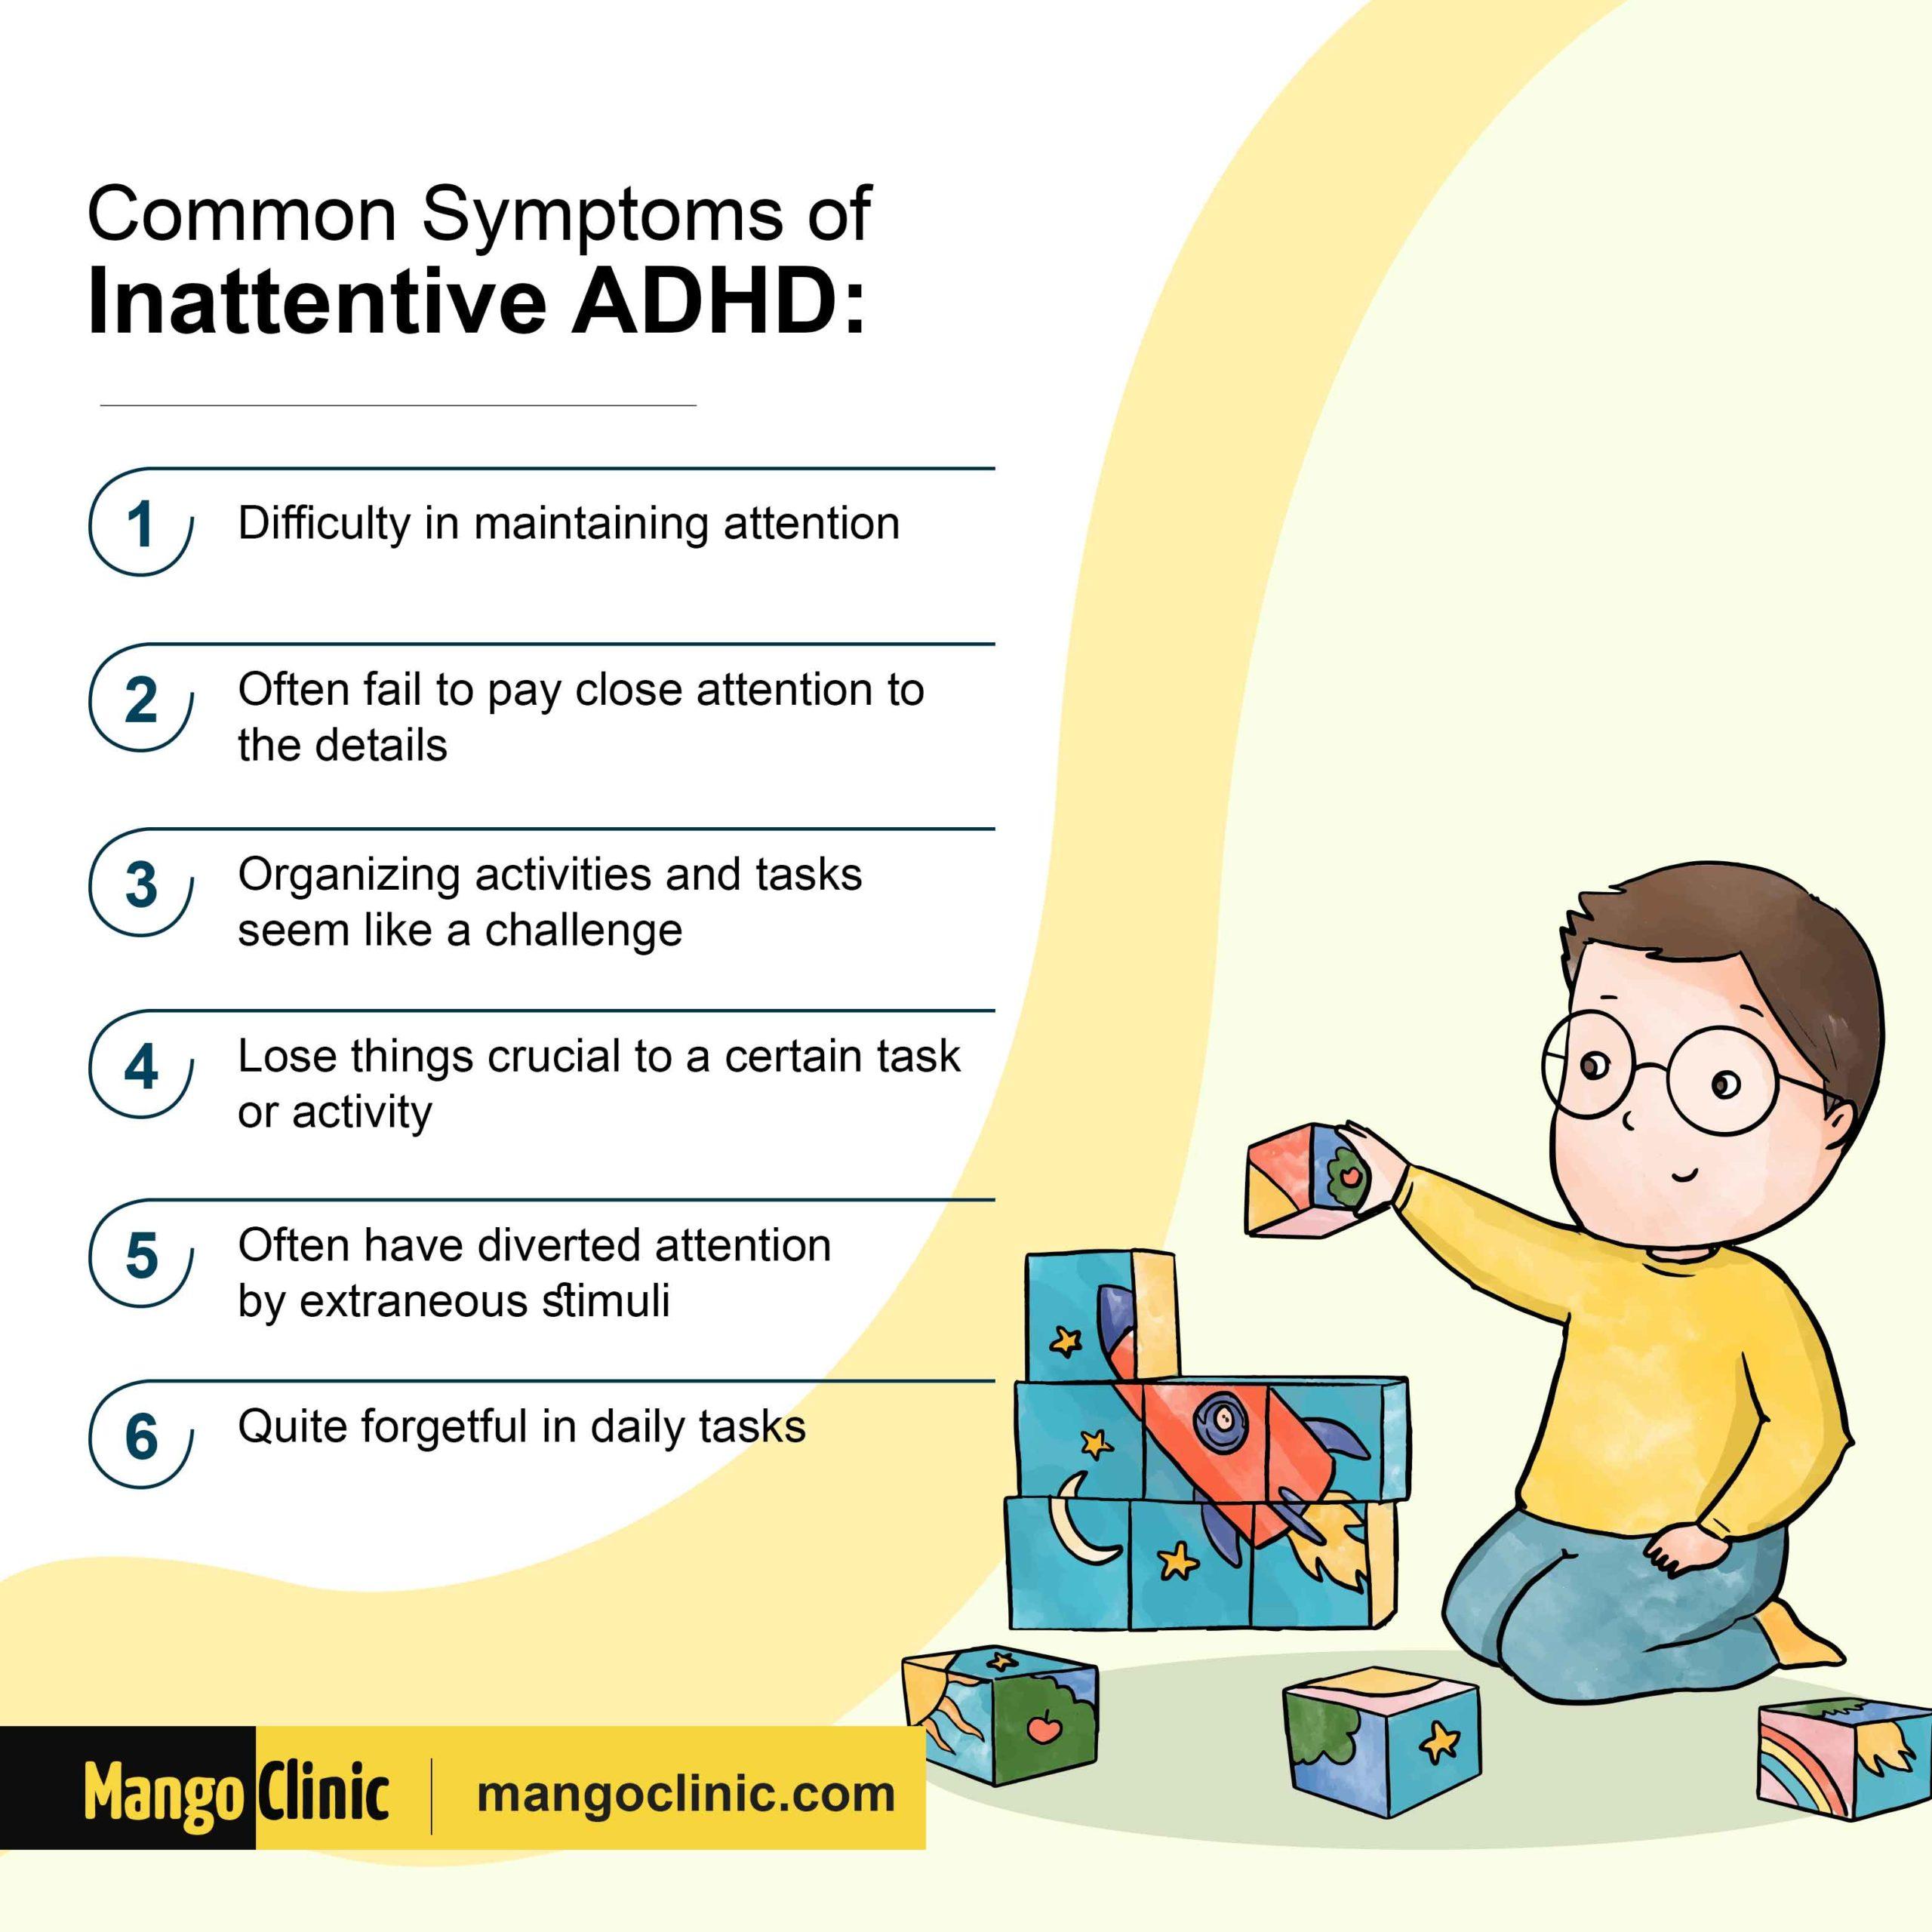 Inattentive ADHD symptoms